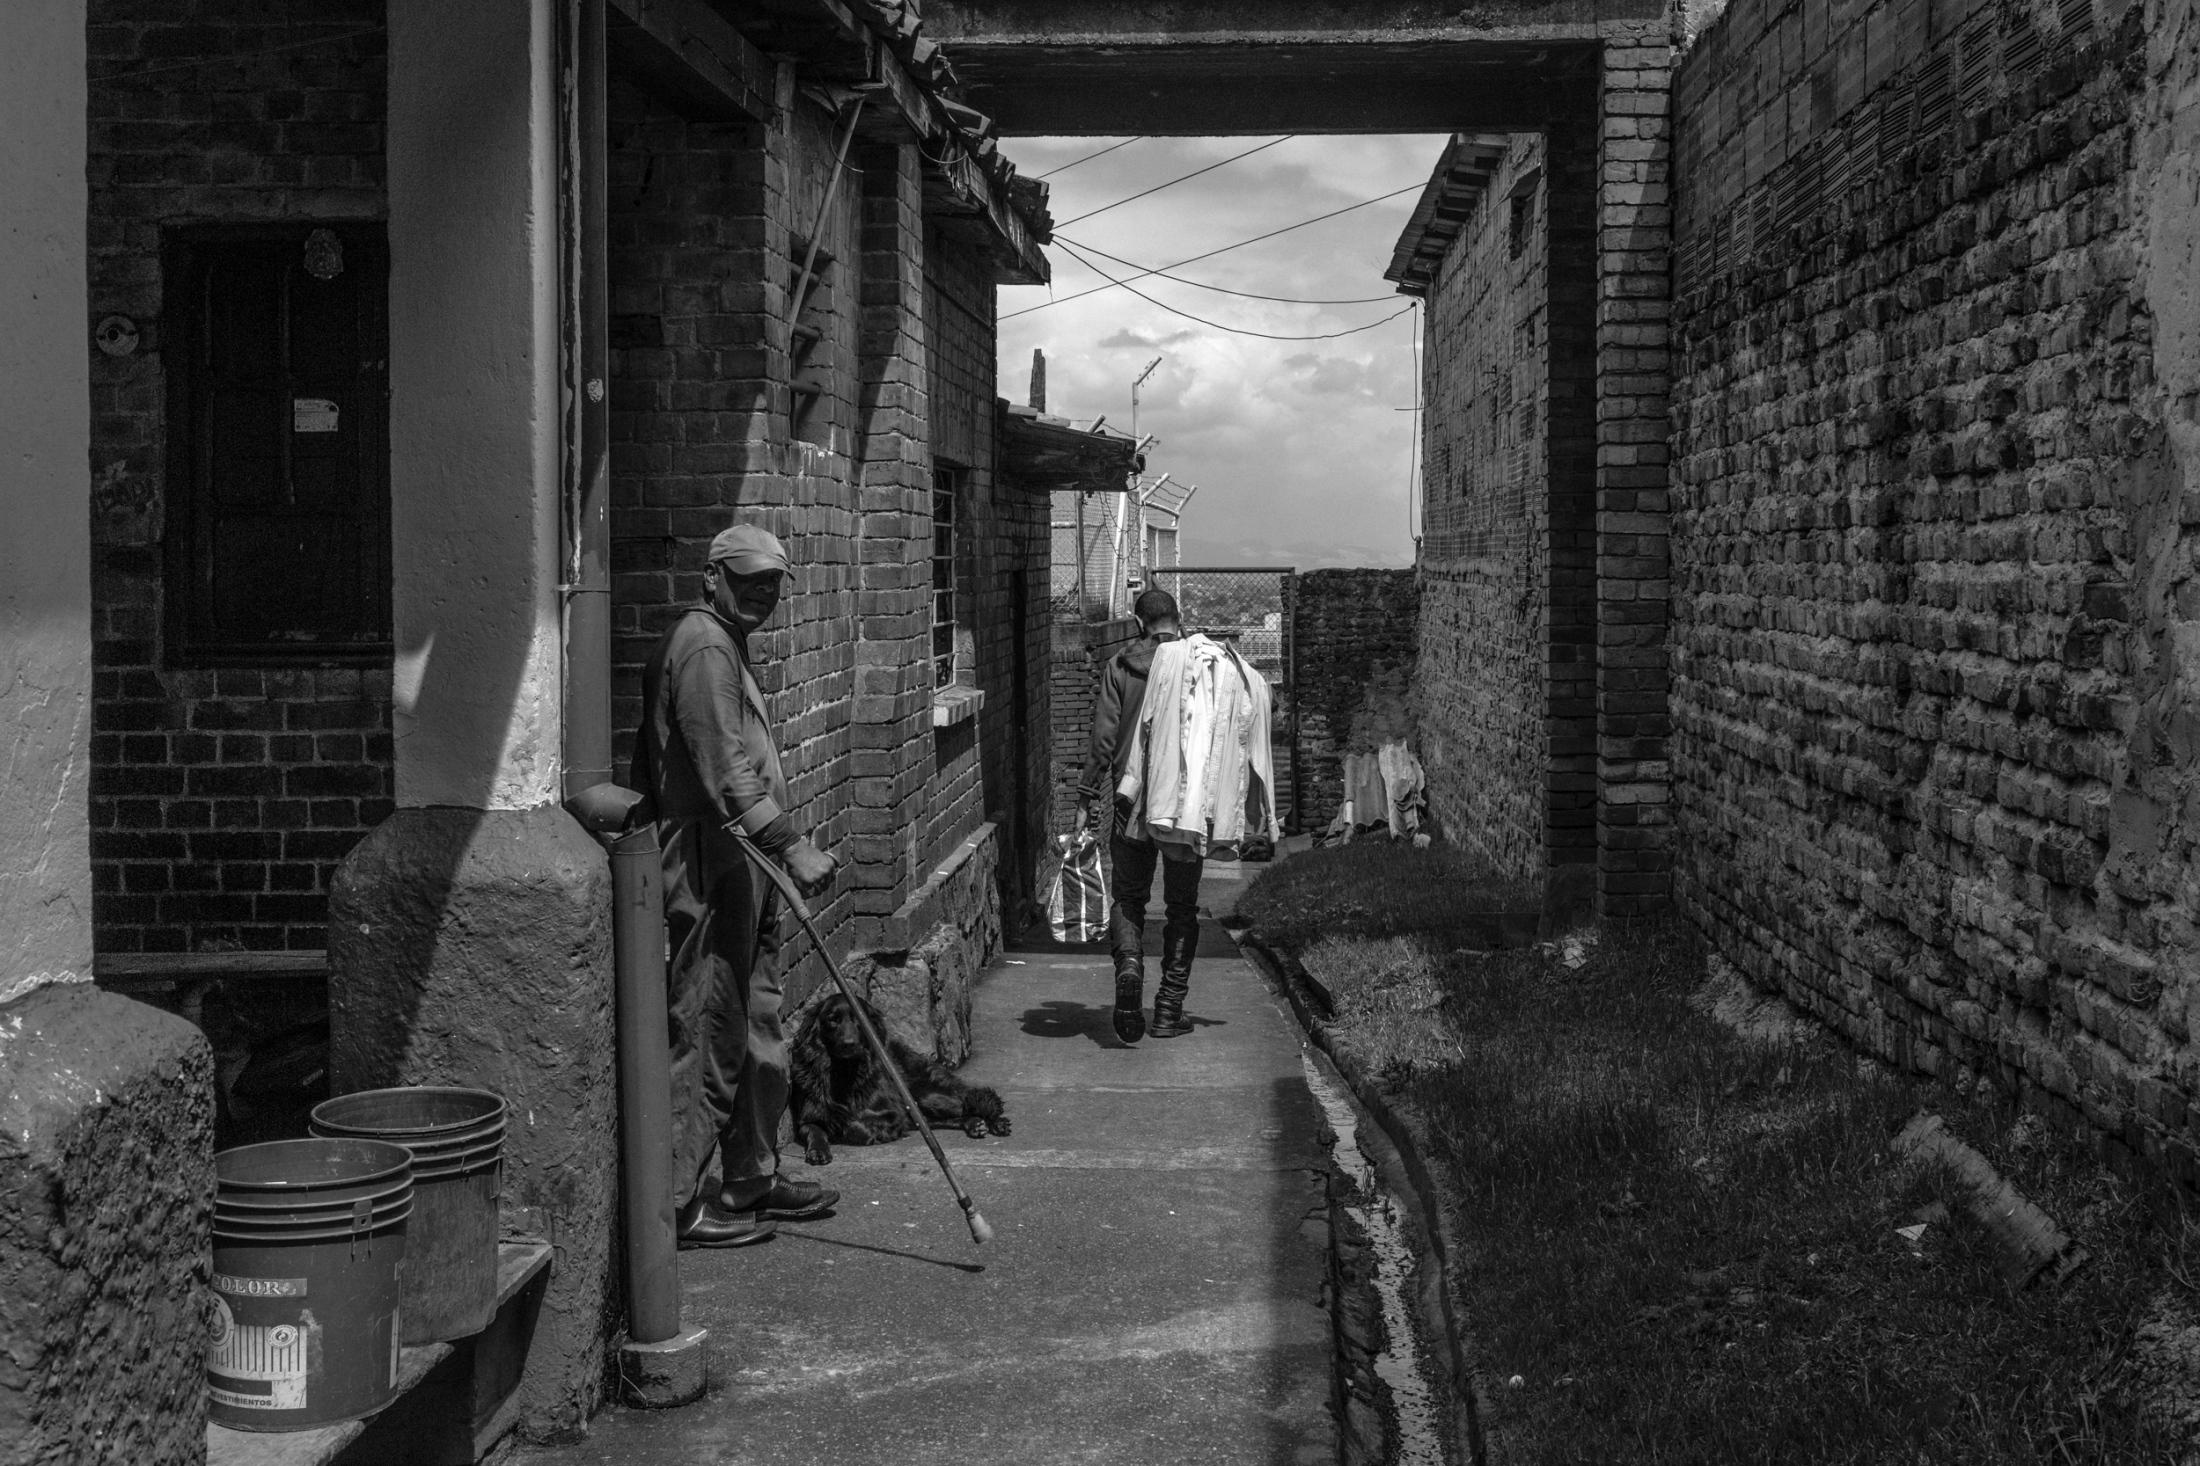 Art and Documentary Photography - Loading ZuletaR__os_CarangasYElJaguar_017.JPG